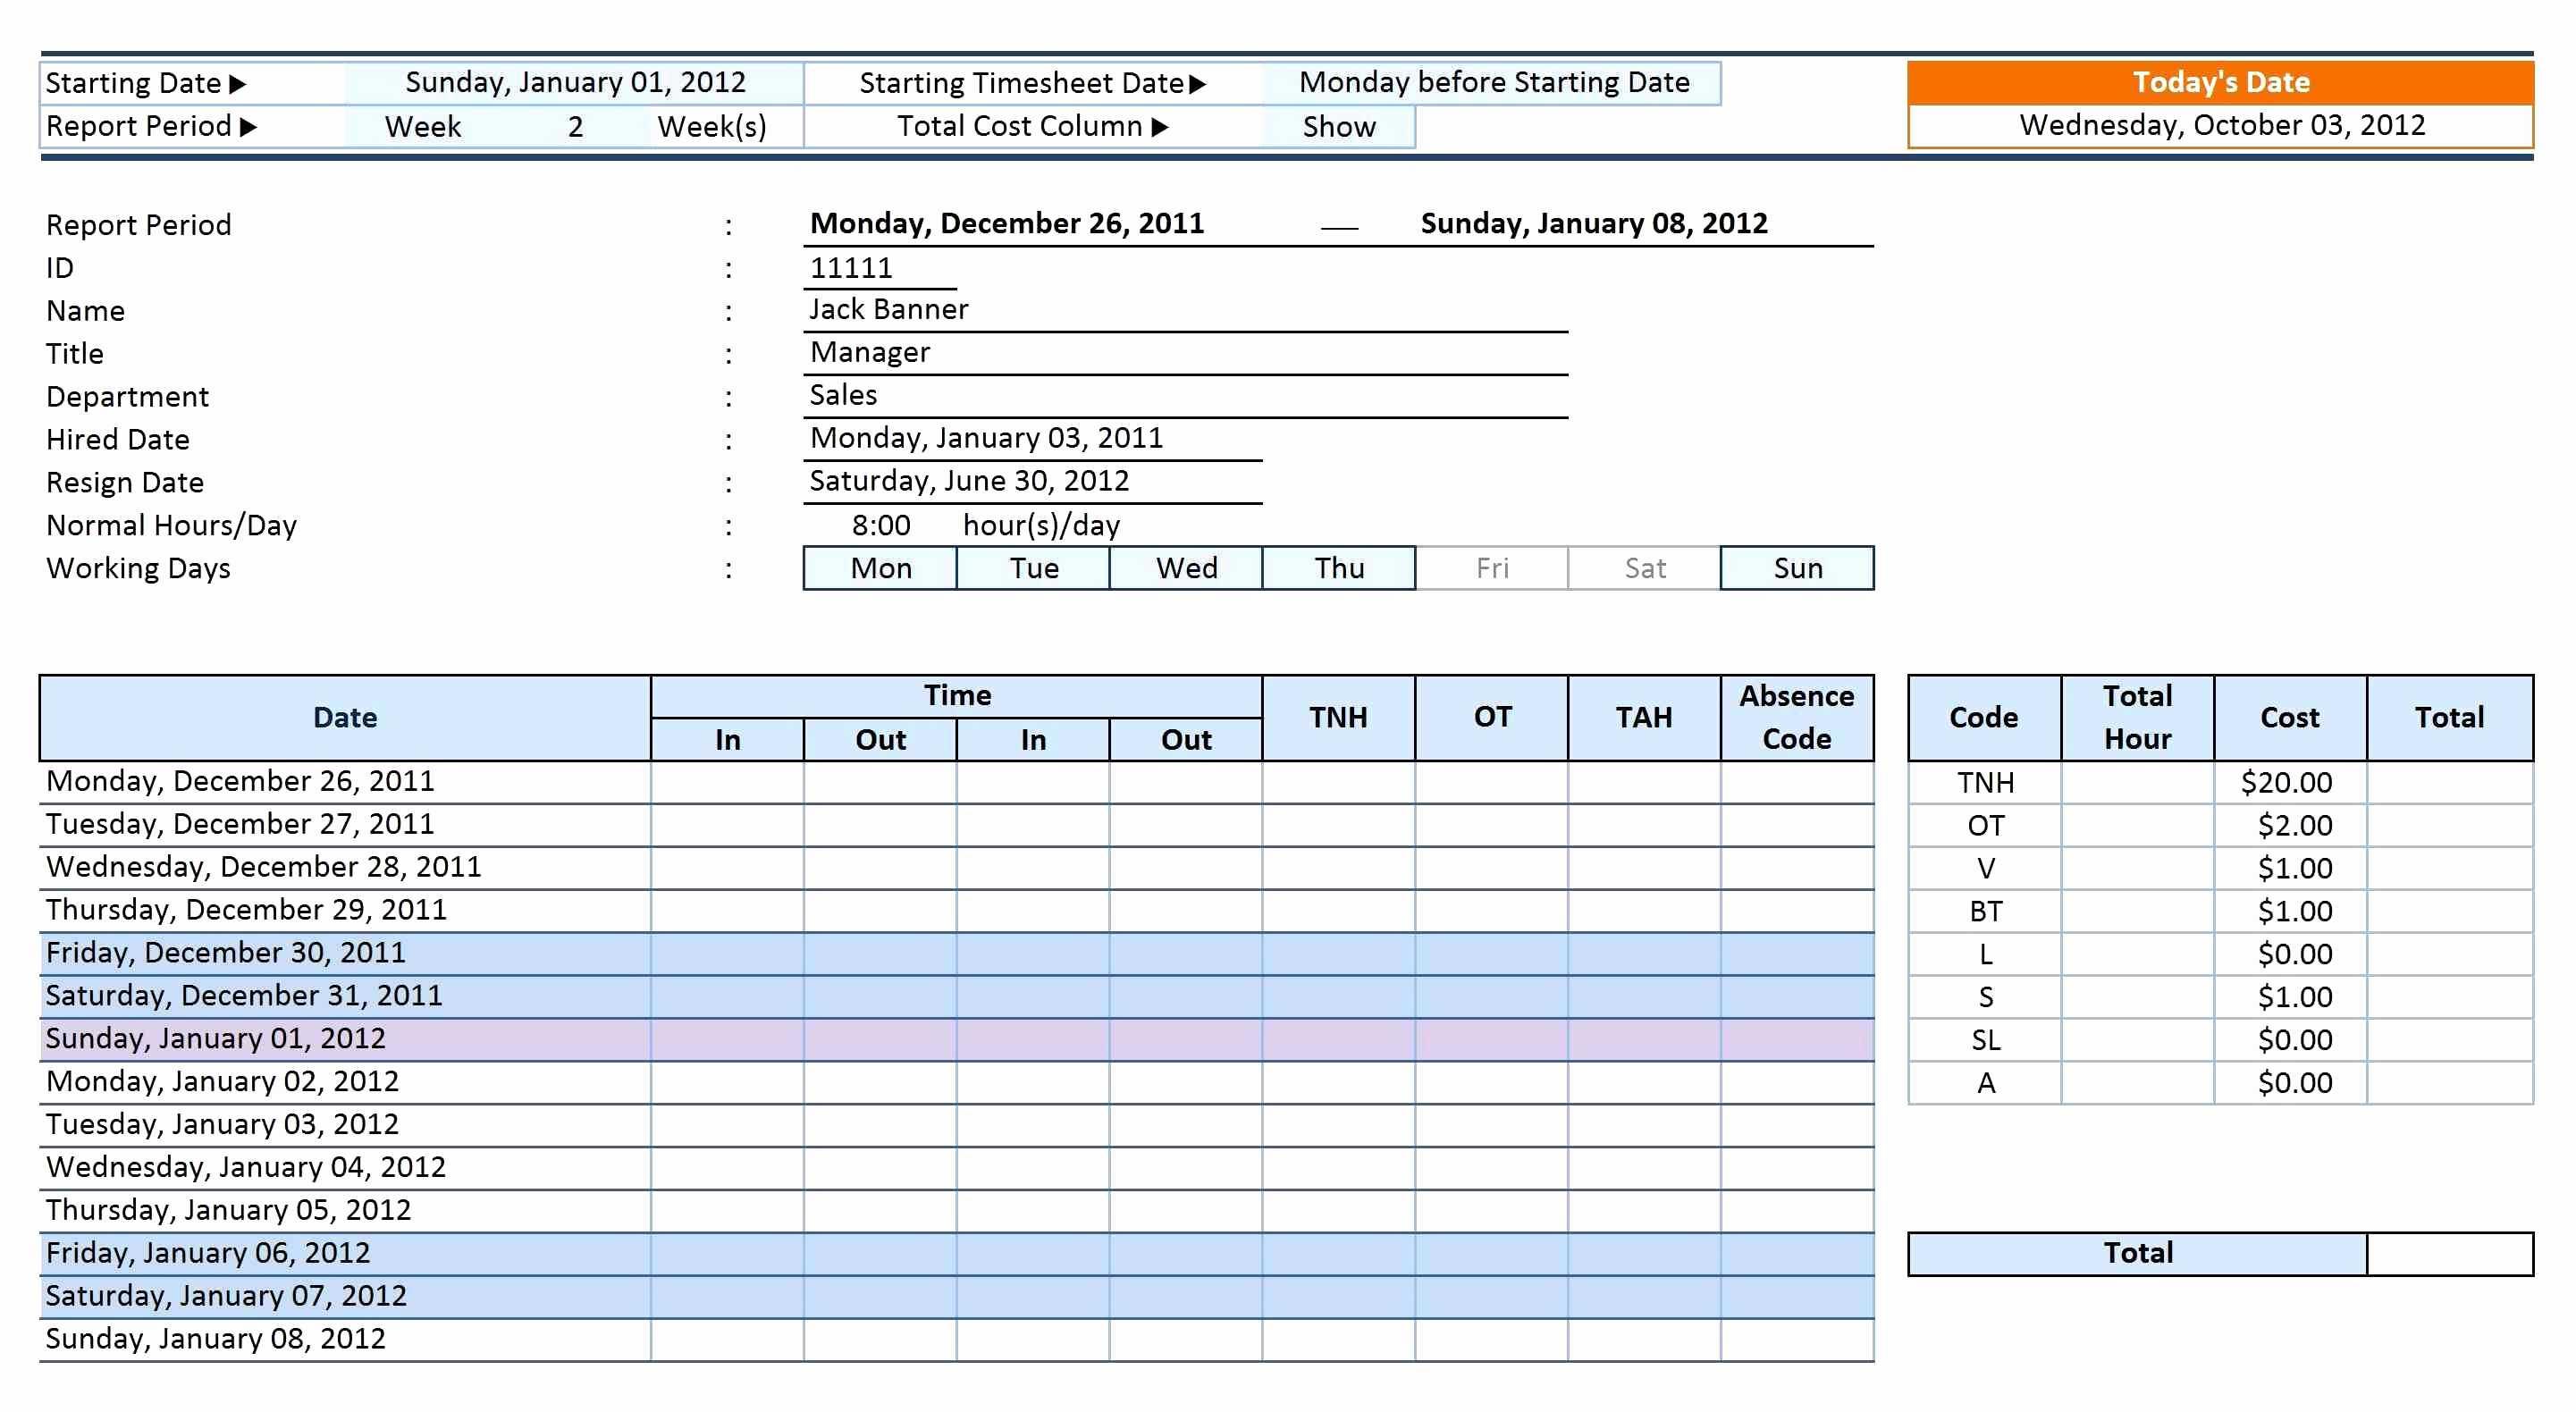 Business Valuation Spreadsheet As Spreadsheet Templates How To Use And Business Valuation Spreadsheet